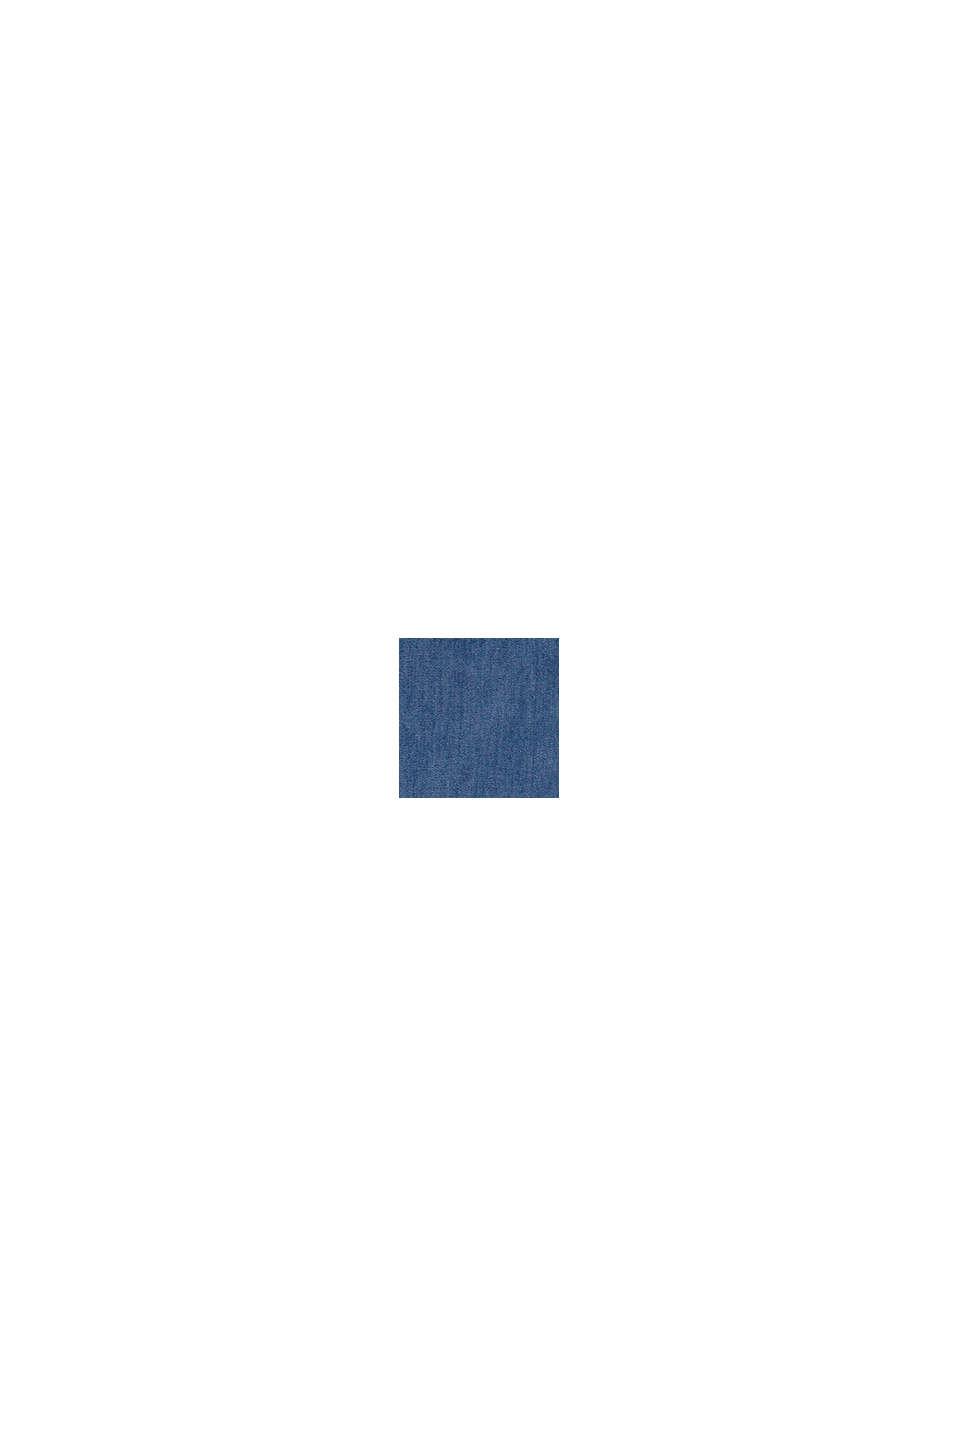 Met lyocell: jurk met volant en een denim look, BLUE MEDIUM WASHED, swatch